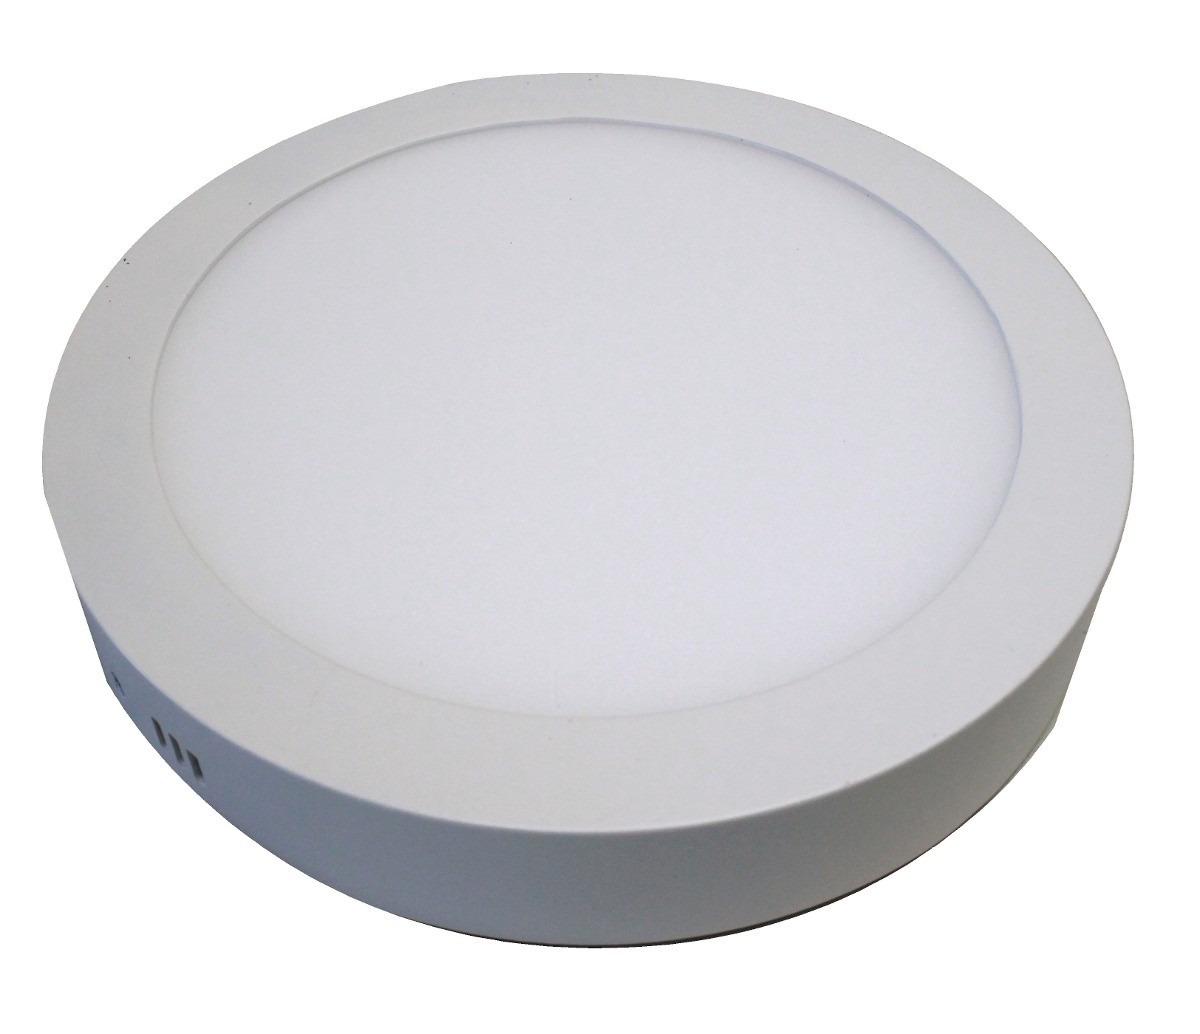 Kit 10 Painel Plafon Redondo Luminária Sobrepor Led 24W Bivolt Branco Quente - RPC-COMMERCE